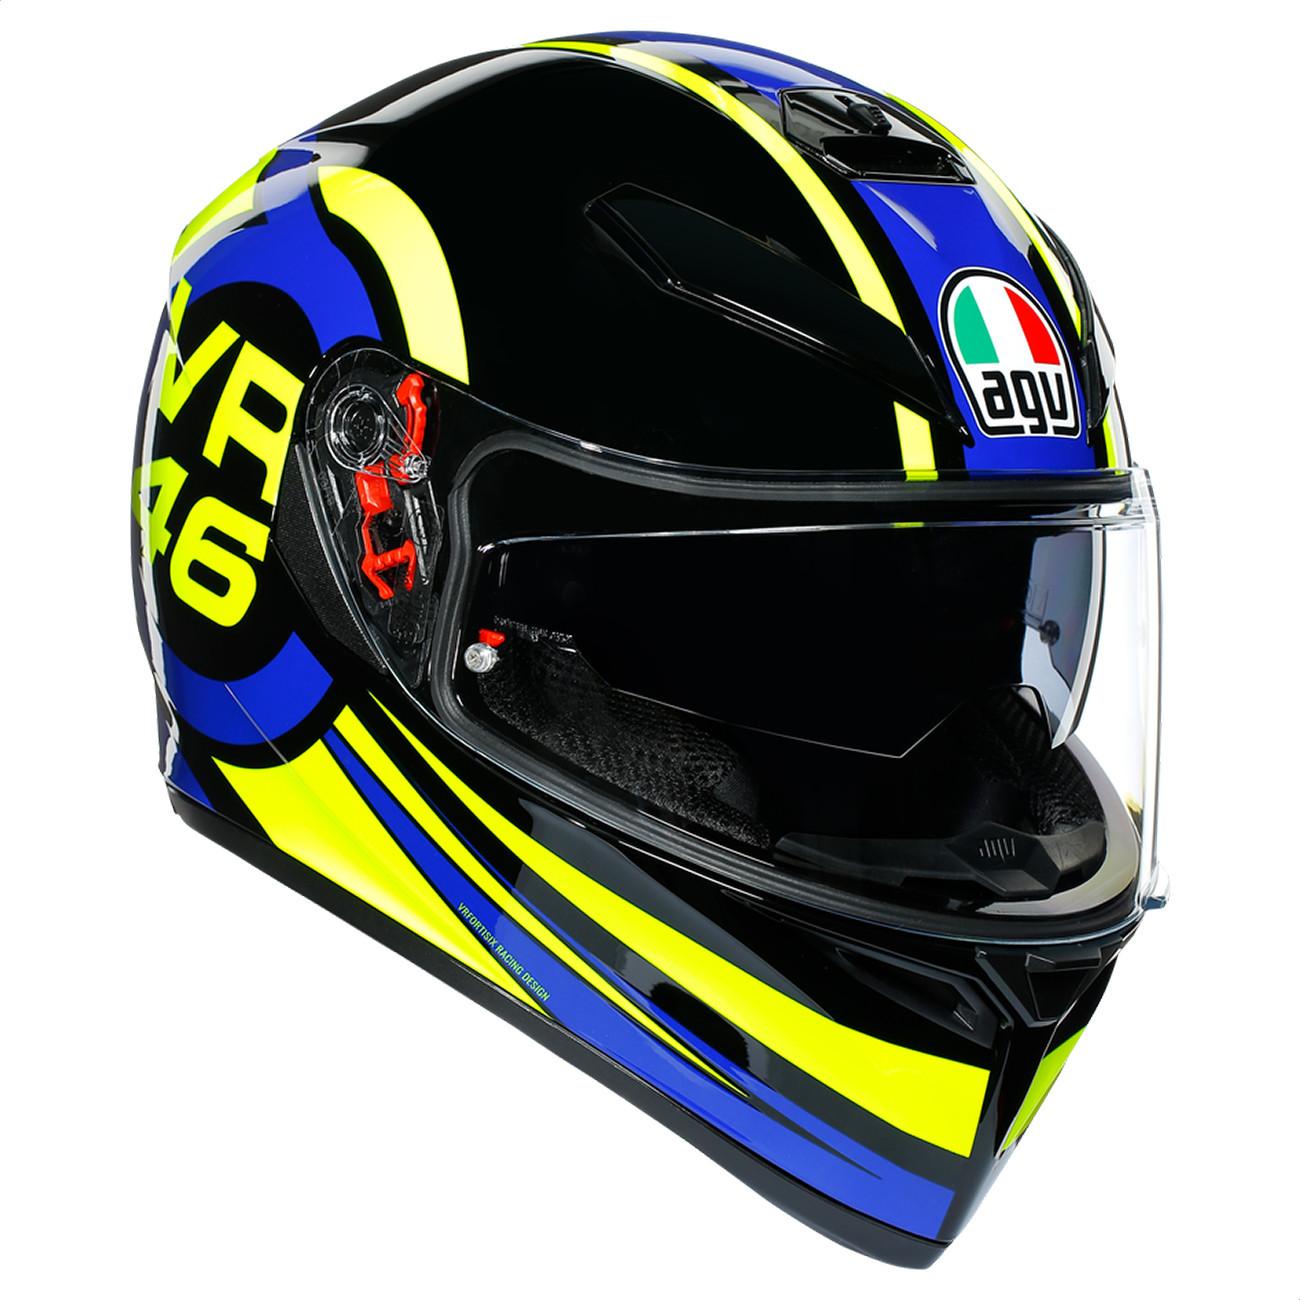 Casco Integral AGV K3 SV Top Ride 46 Valentino Rossi